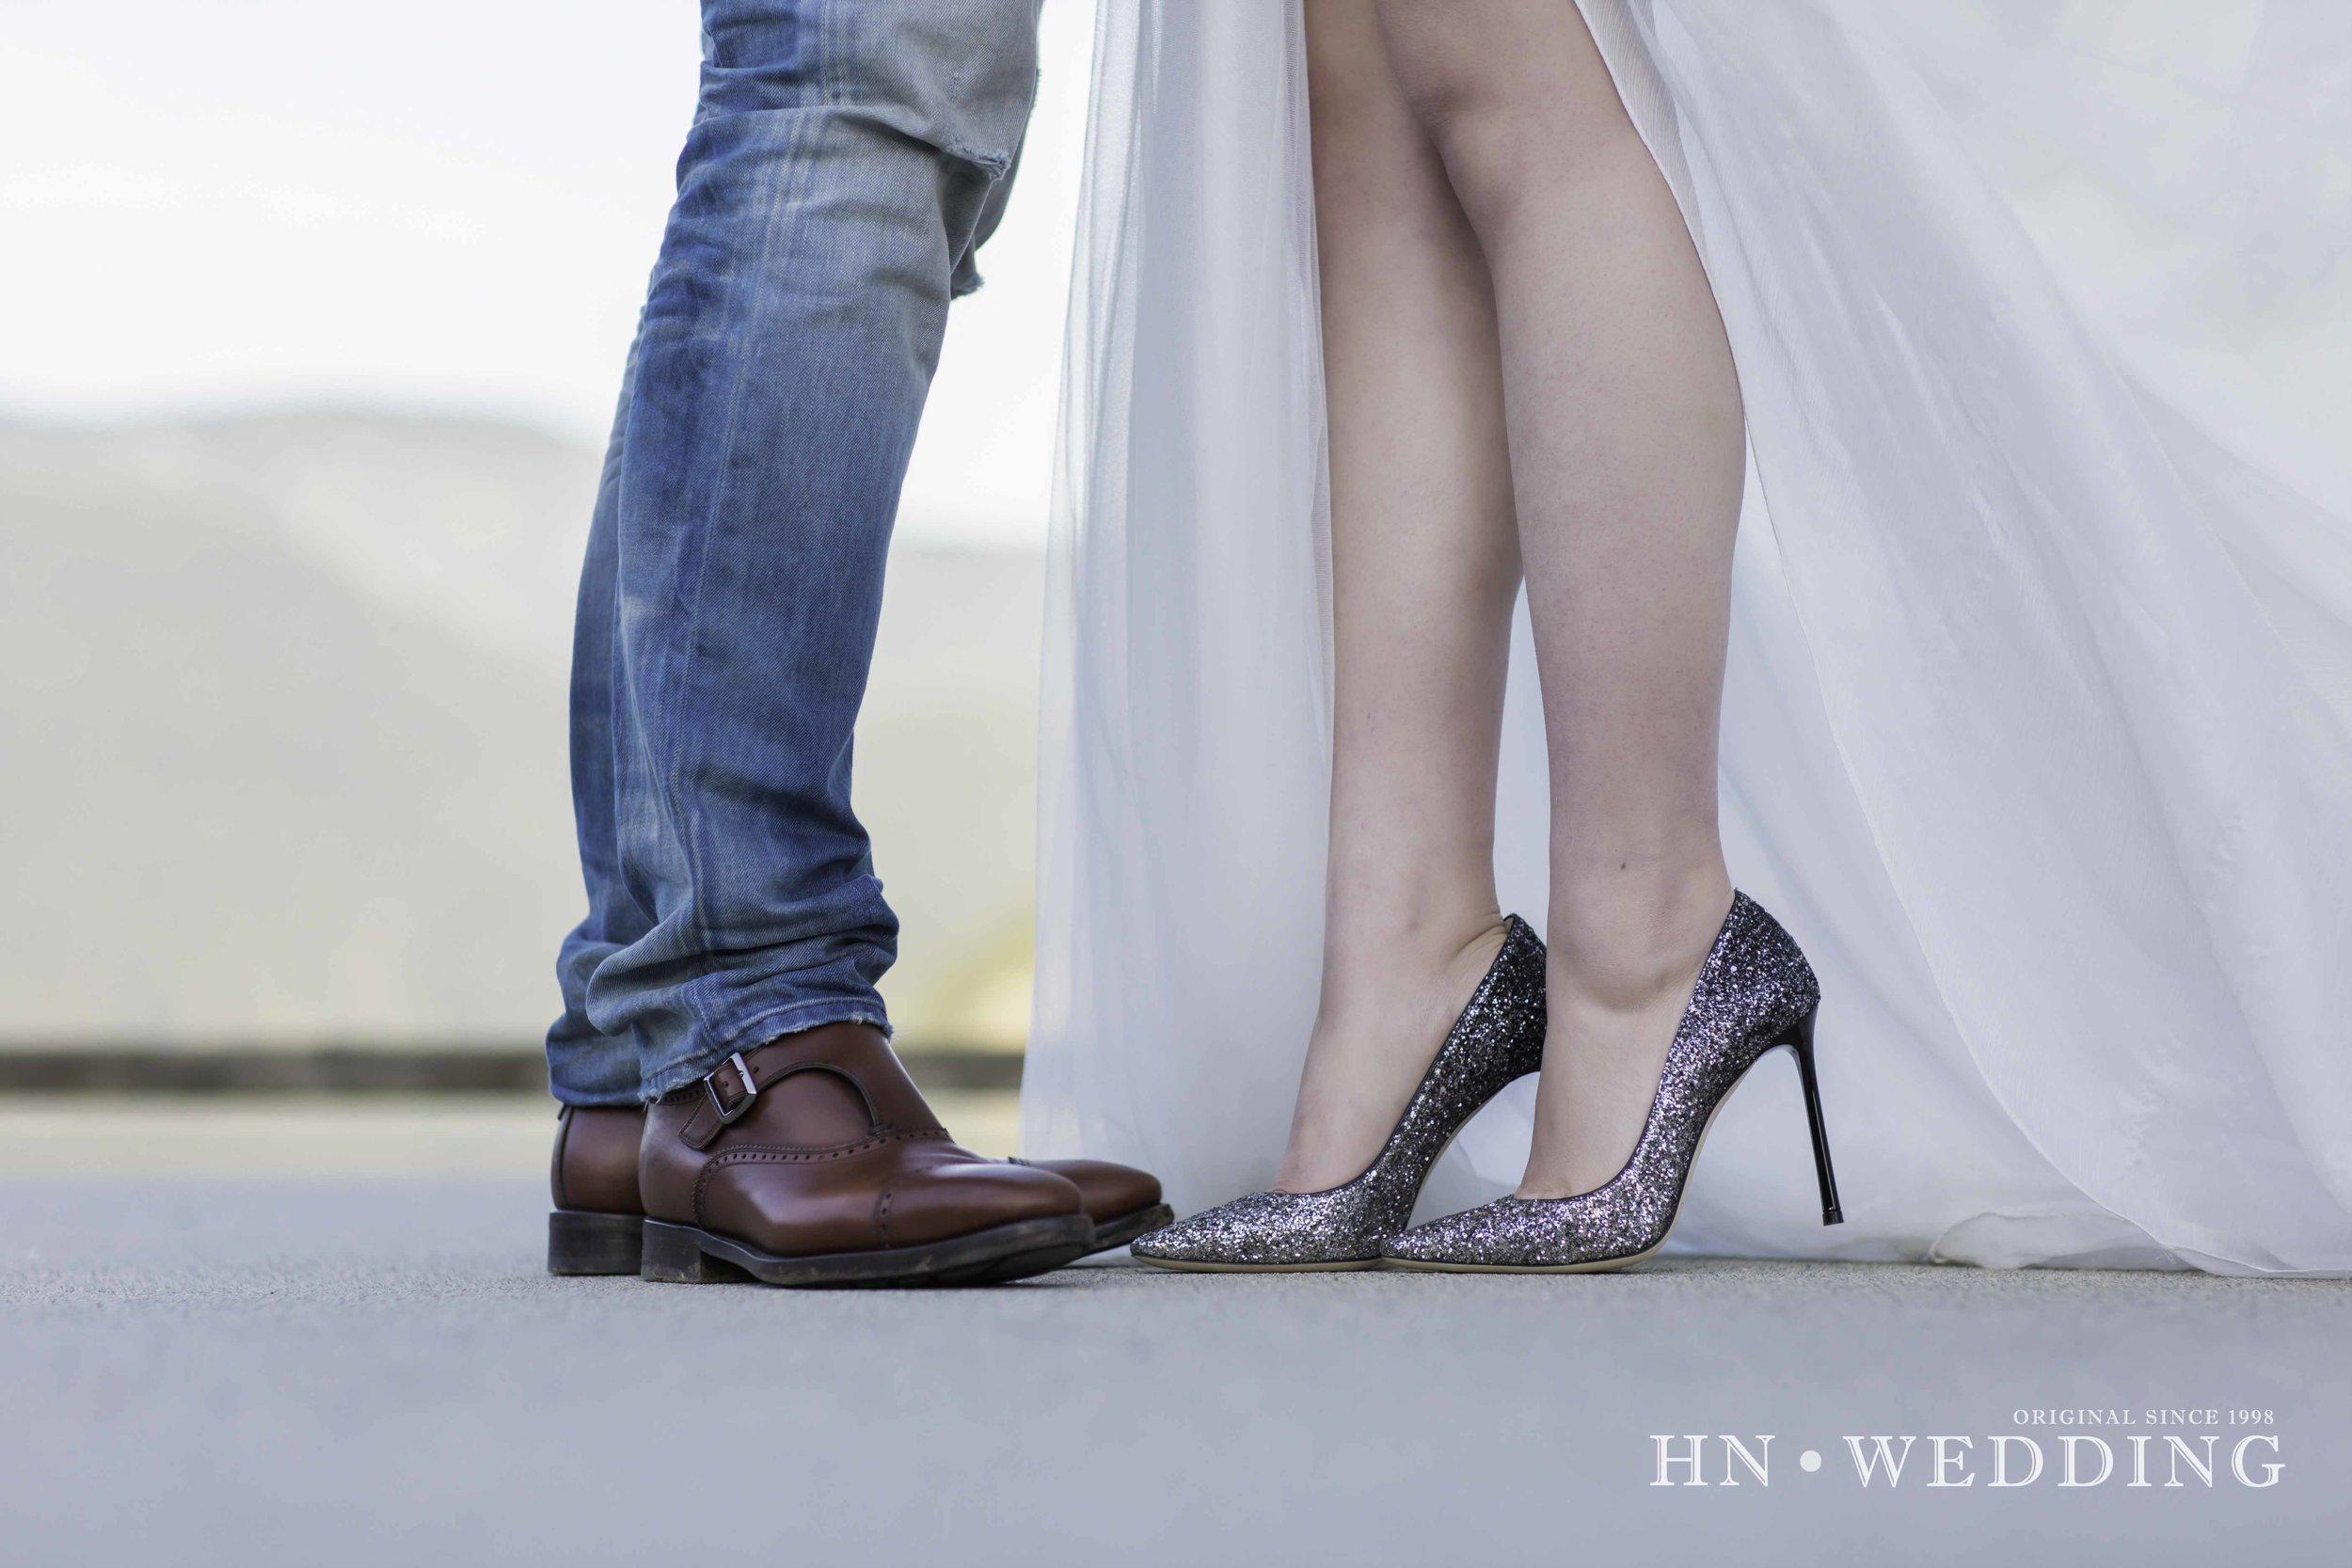 HNwedding-20170403-prewedding-0236.jpg